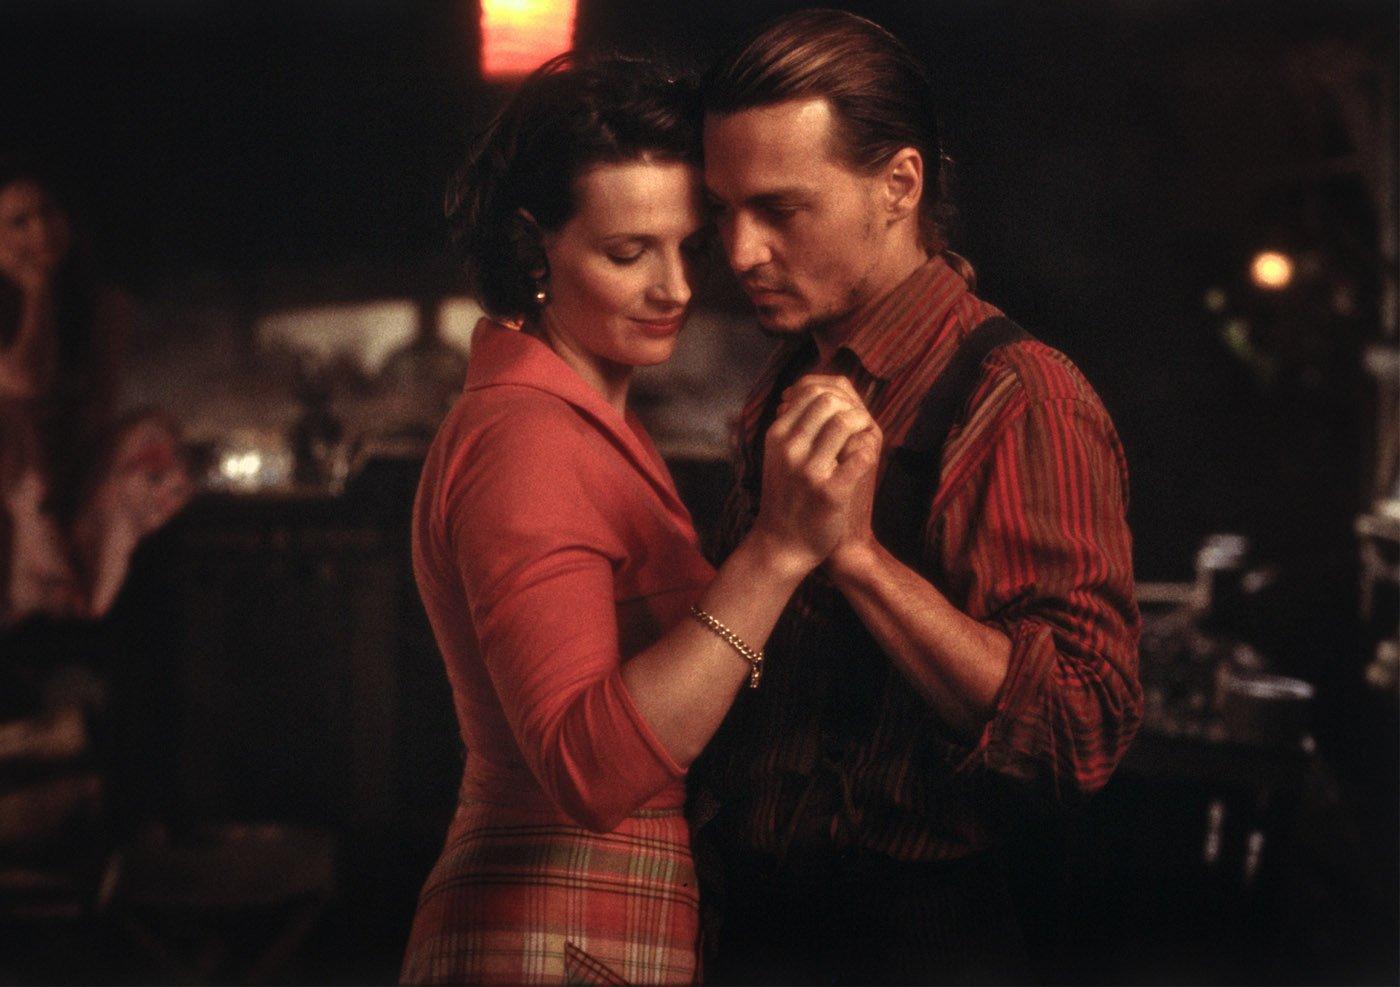 Spiritual romance in the movie Chocolat